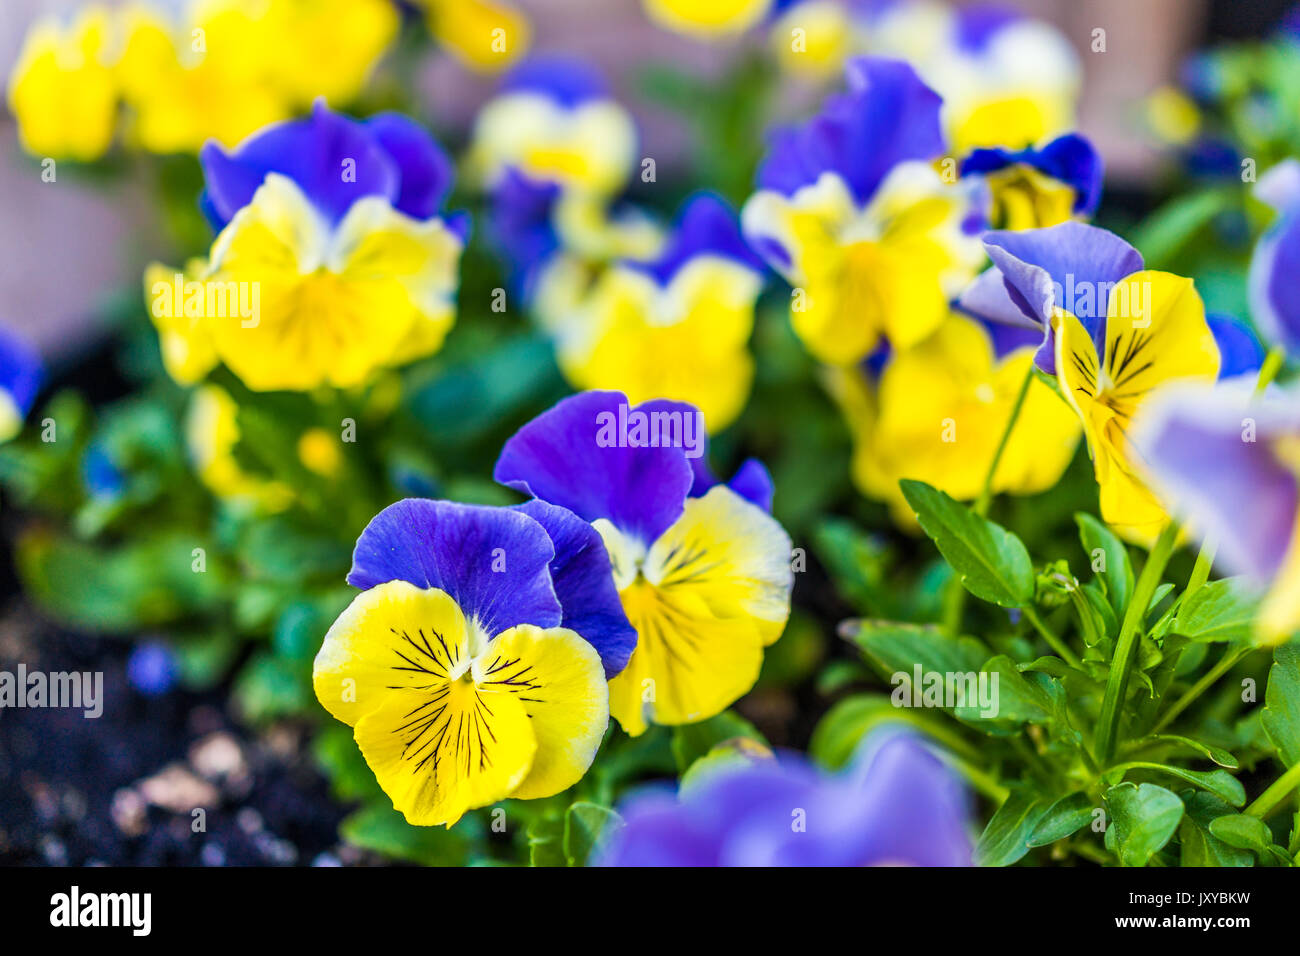 Yellow Pansy Flower Pot Stock Photos Yellow Pansy Flower Pot Stock